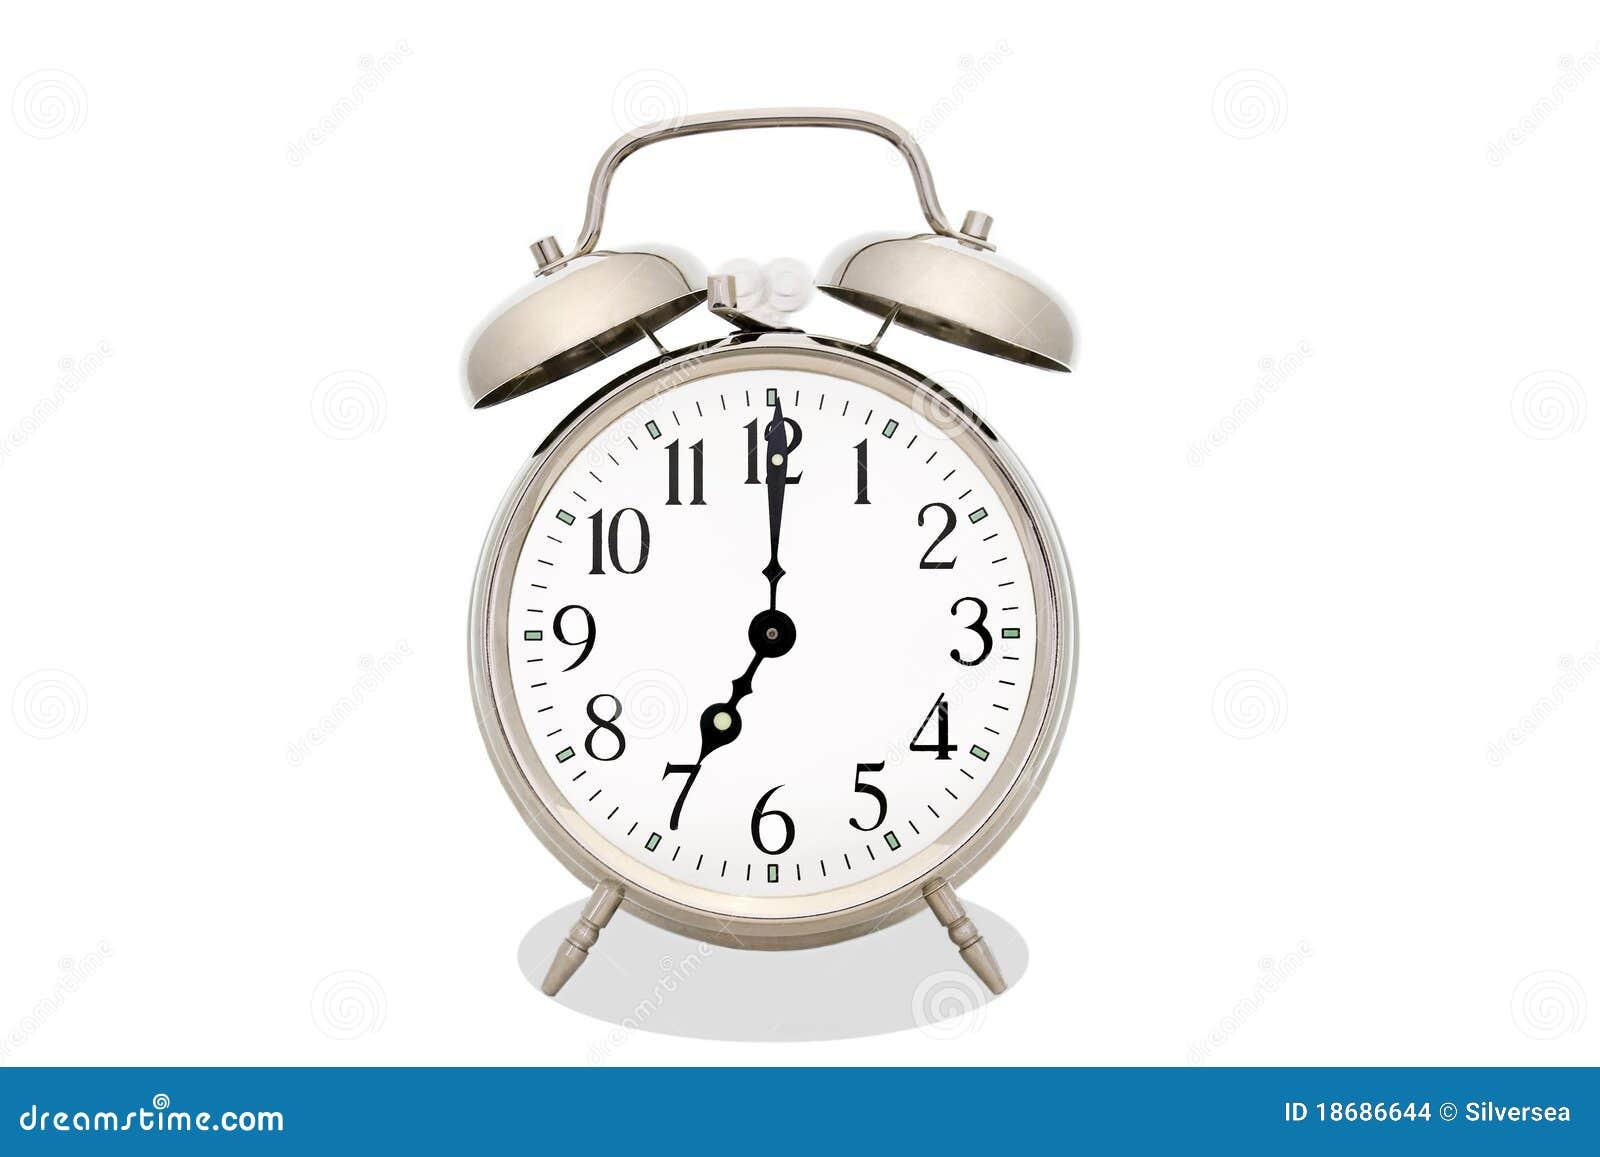 Ringing Alarm Clock Stock Images - Image: 18686644